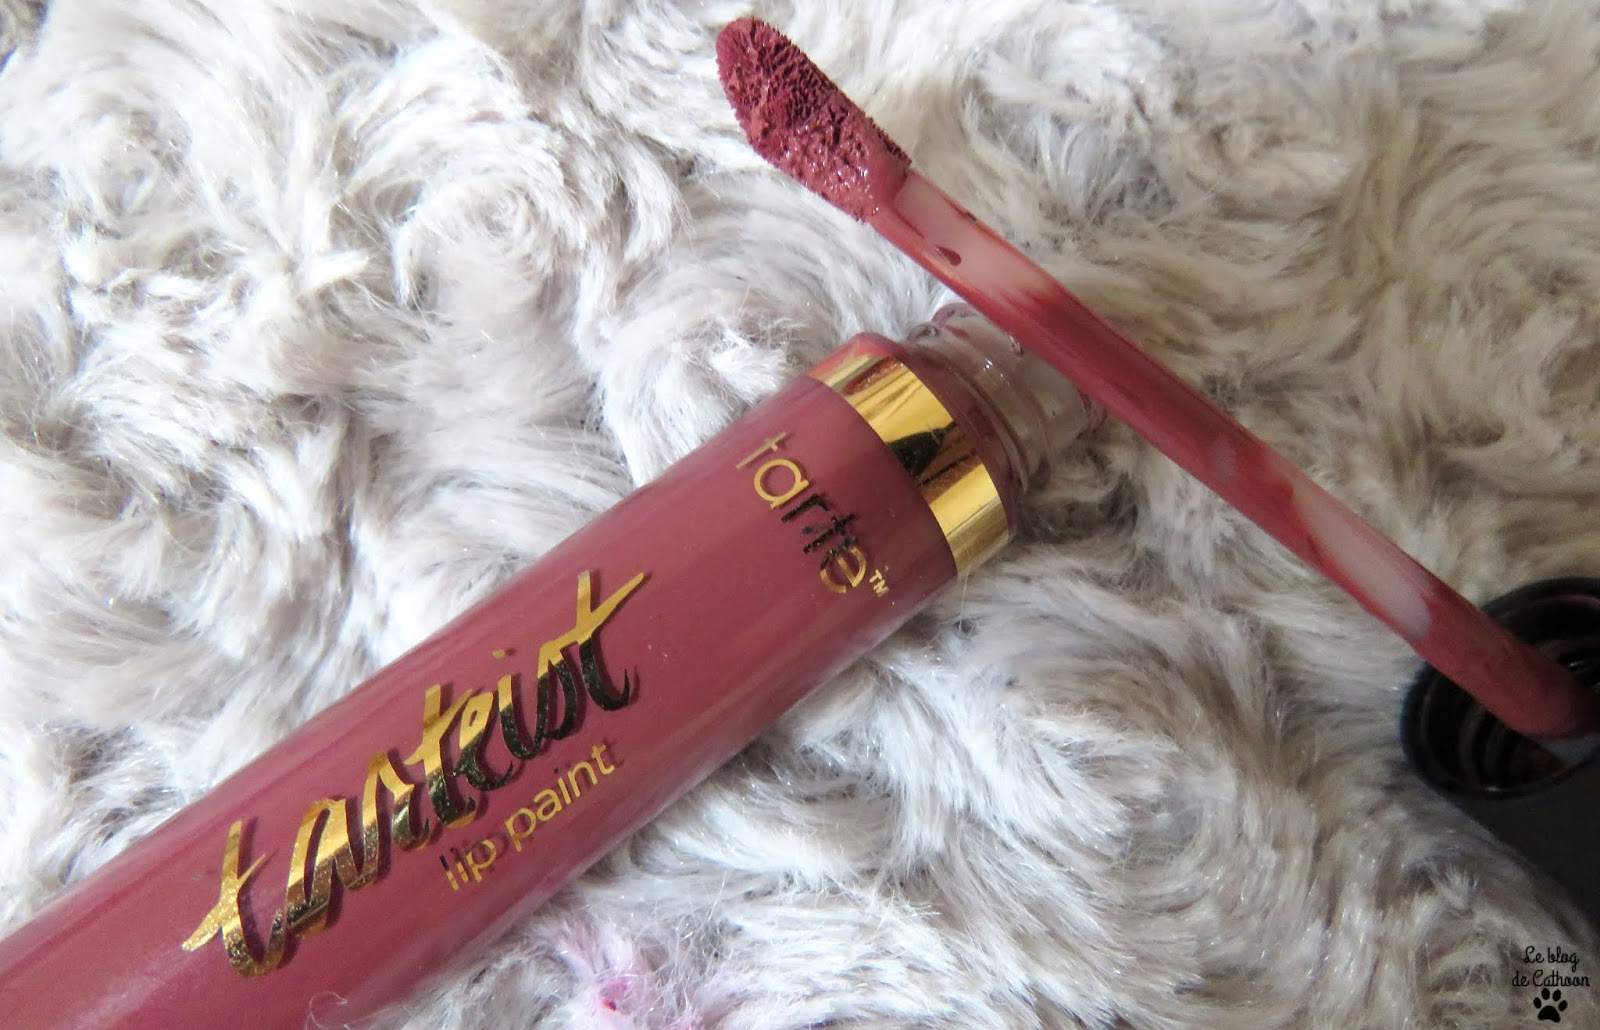 Tarteist Quik Dry Matte Lip Paint - Obsessed - Tarte